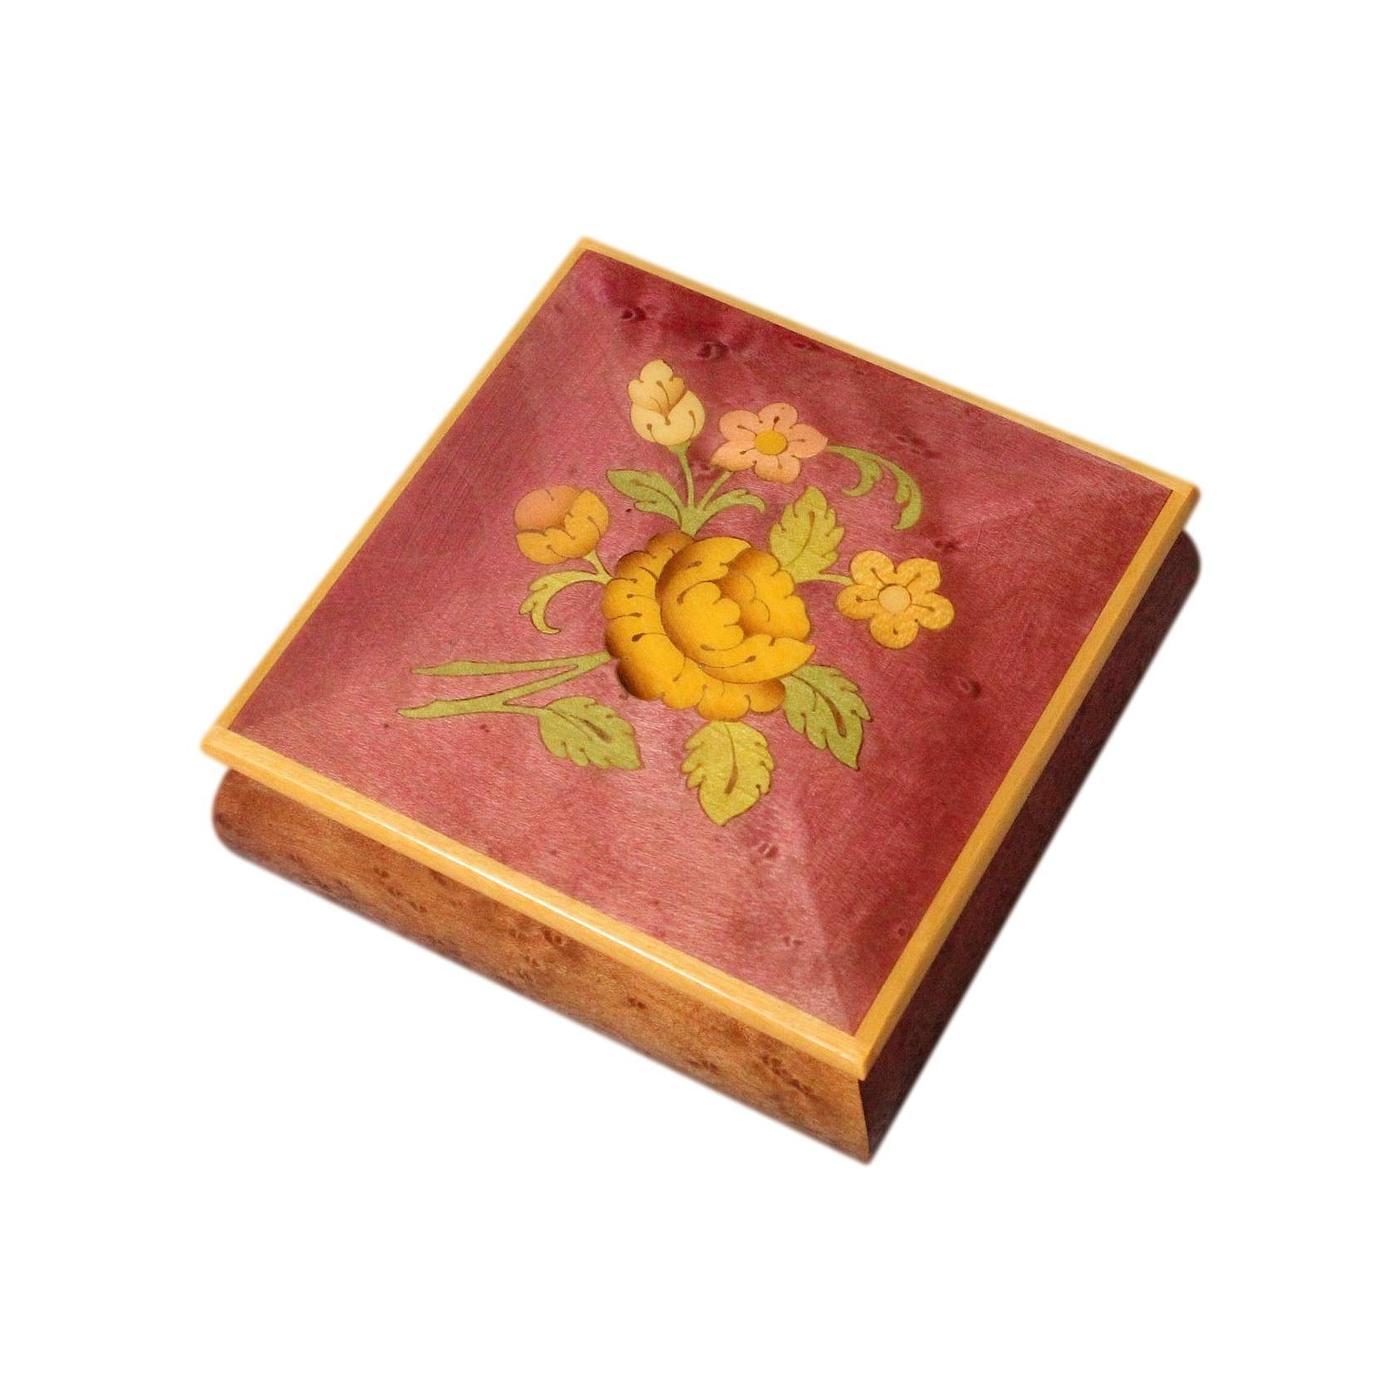 Beautiful Sorrento Enamelled And Inlaid Vintage Jewellery Box